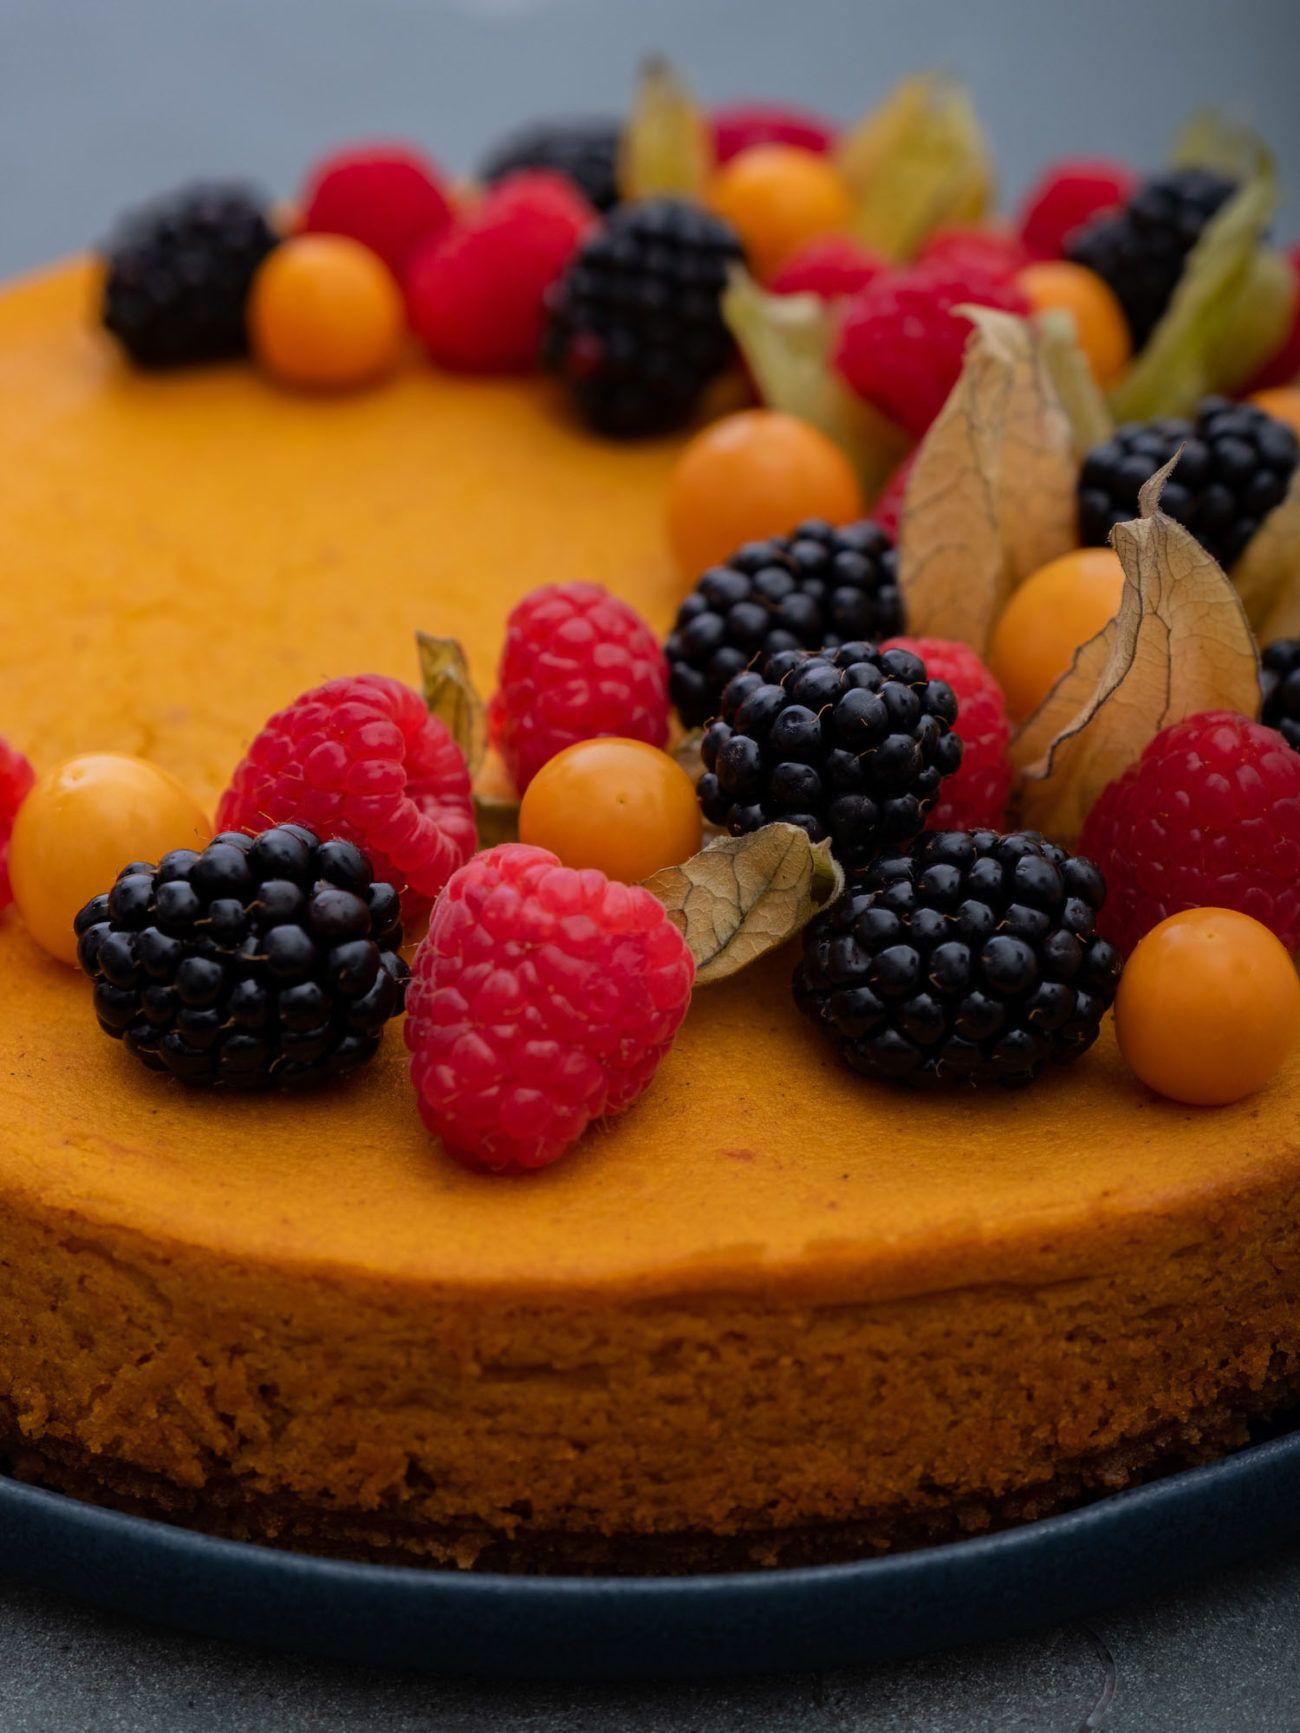 Rezept für Kürbiskuchen mit Keksboden und Beerentopping, Brombeeren, Himbeeren, Physalis